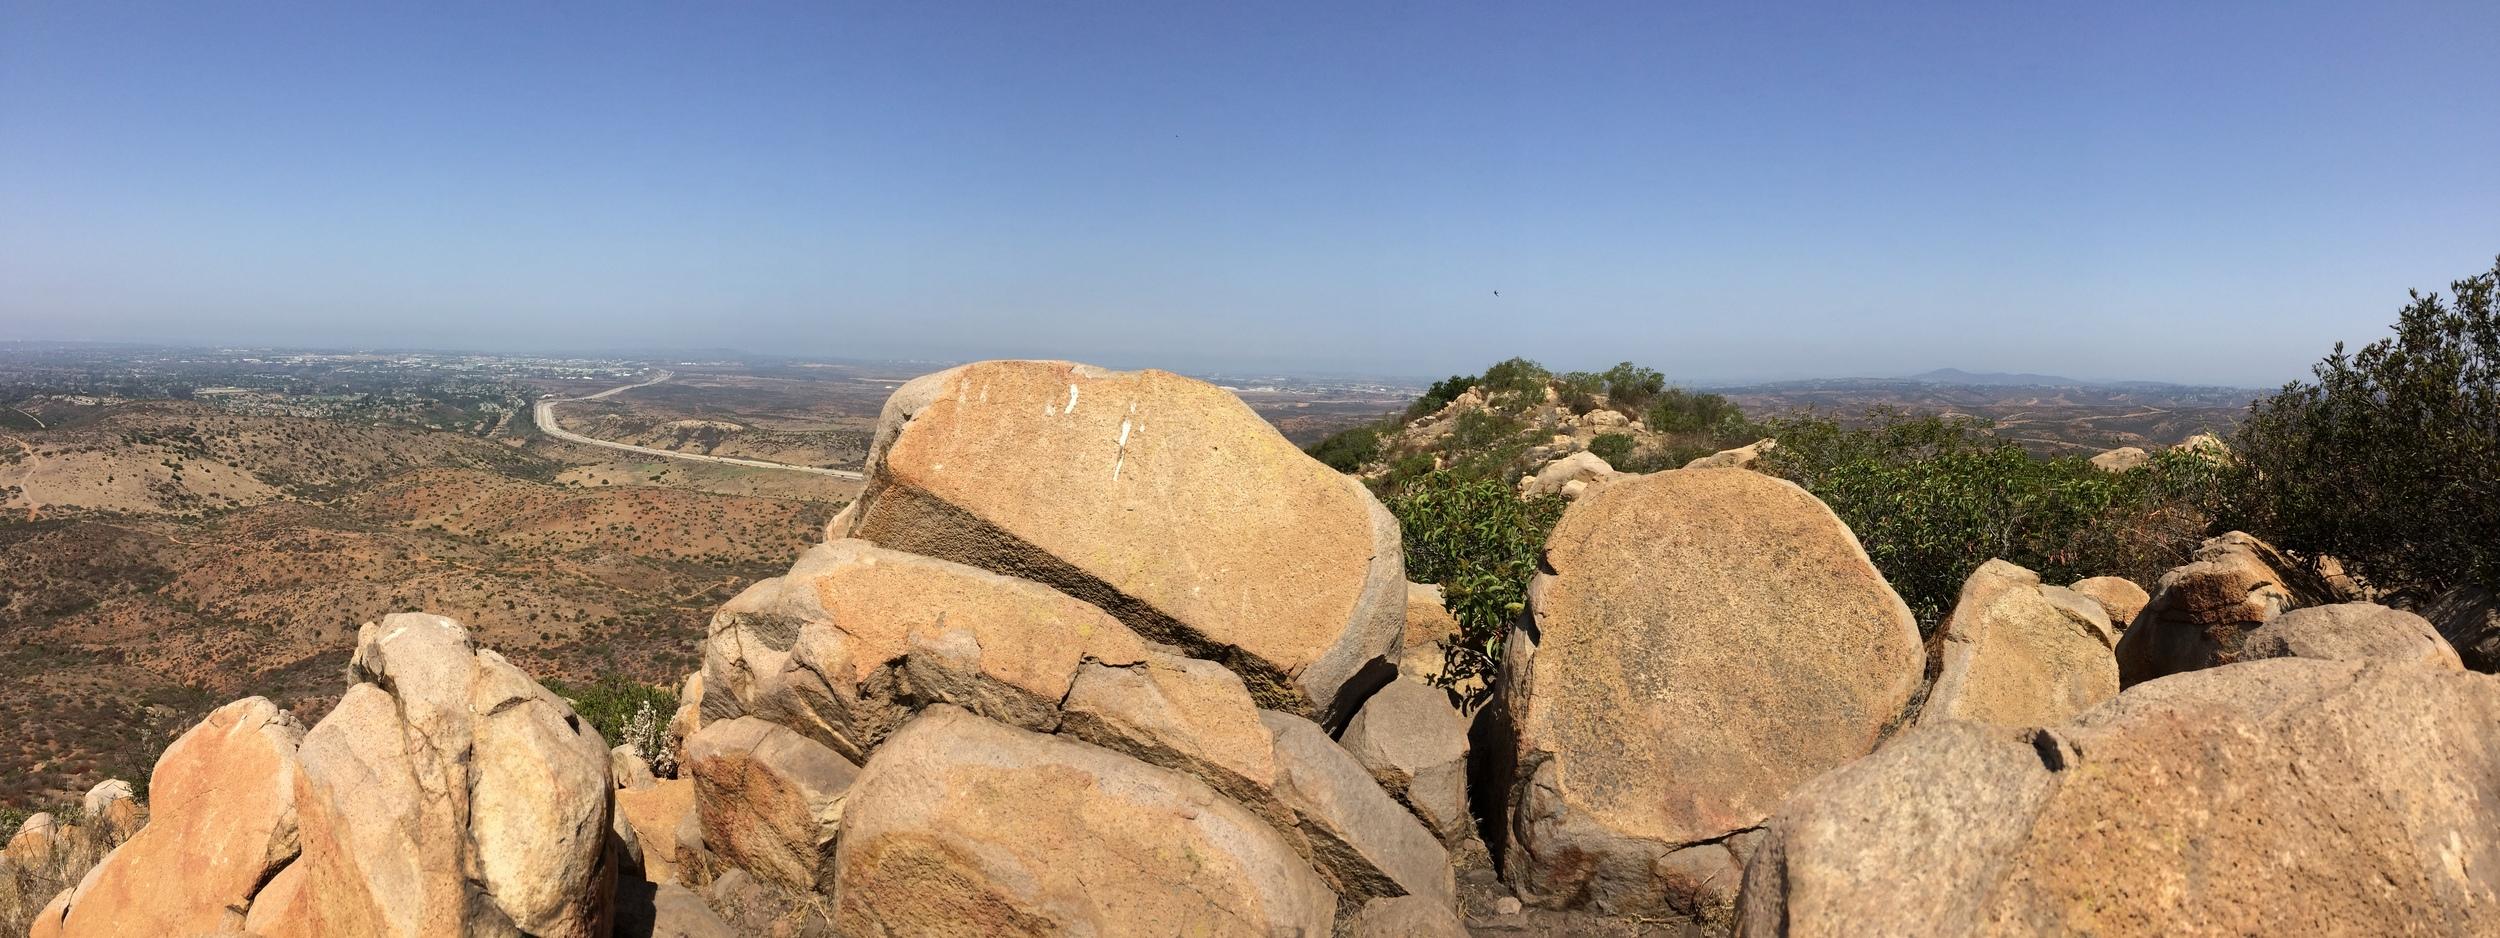 North facing summit panorama, North Fortuna Mountain